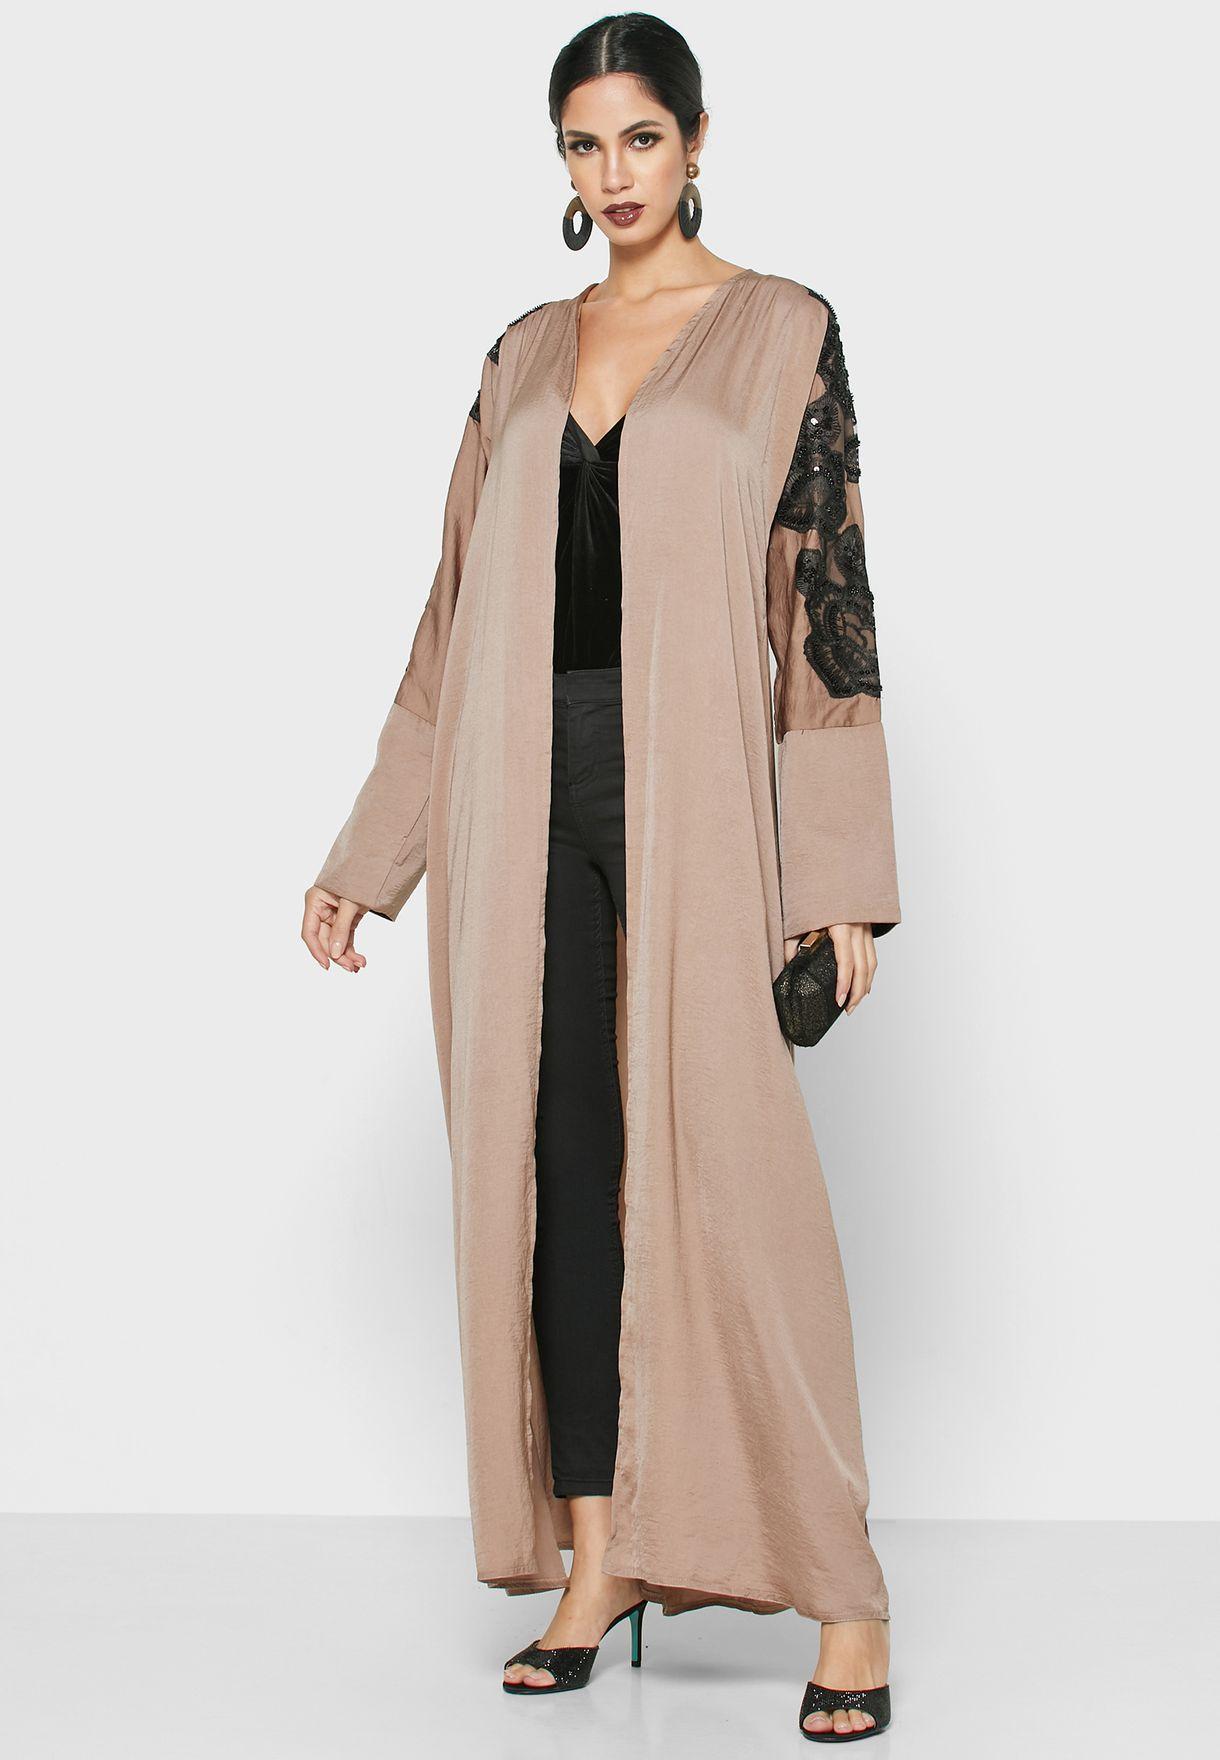 Lace Detail Abaya